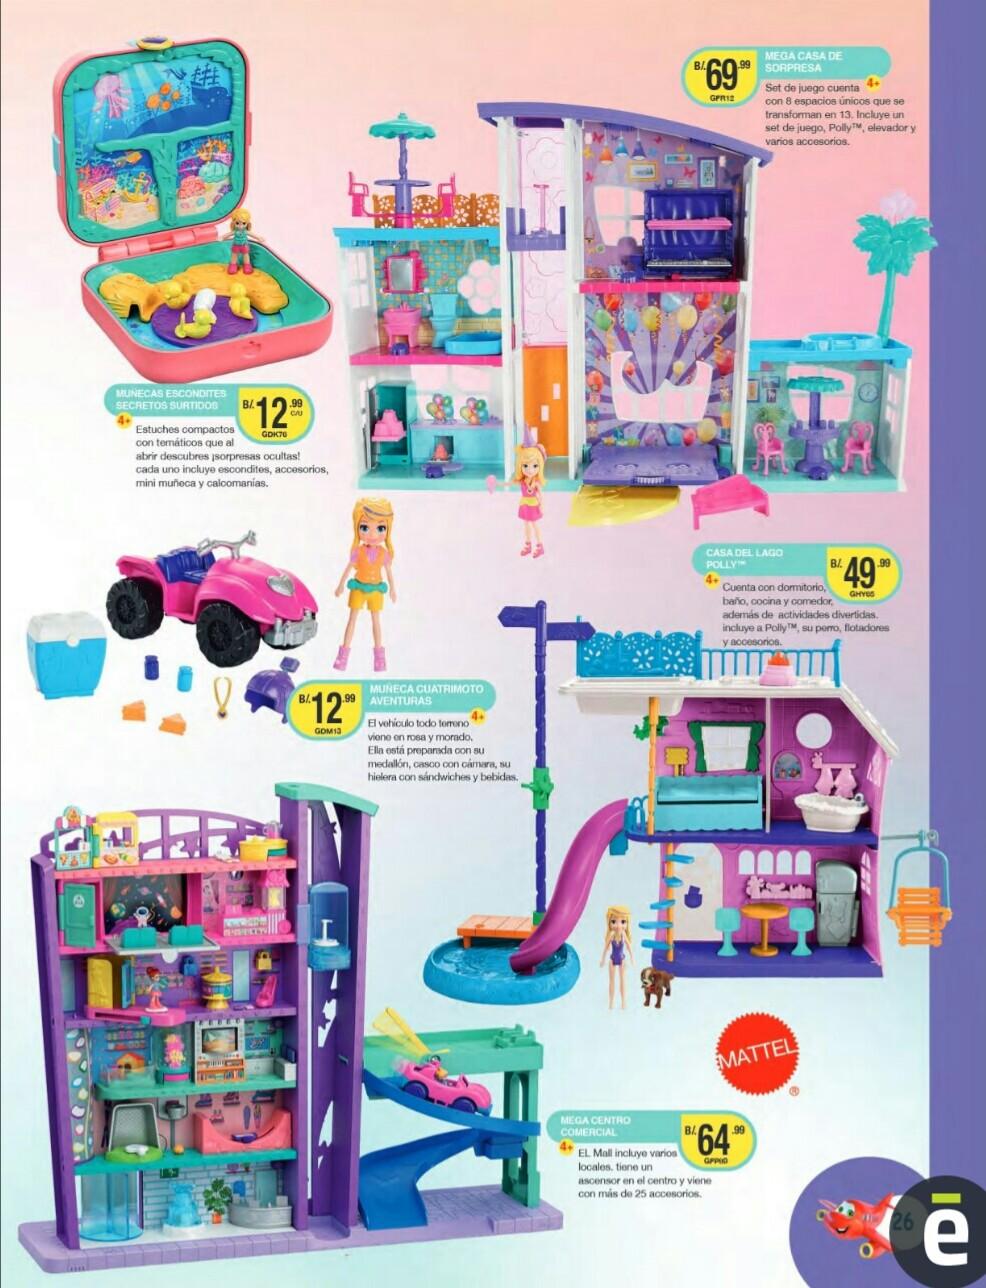 Catalogo juguetes Titan Toys 2019 p26